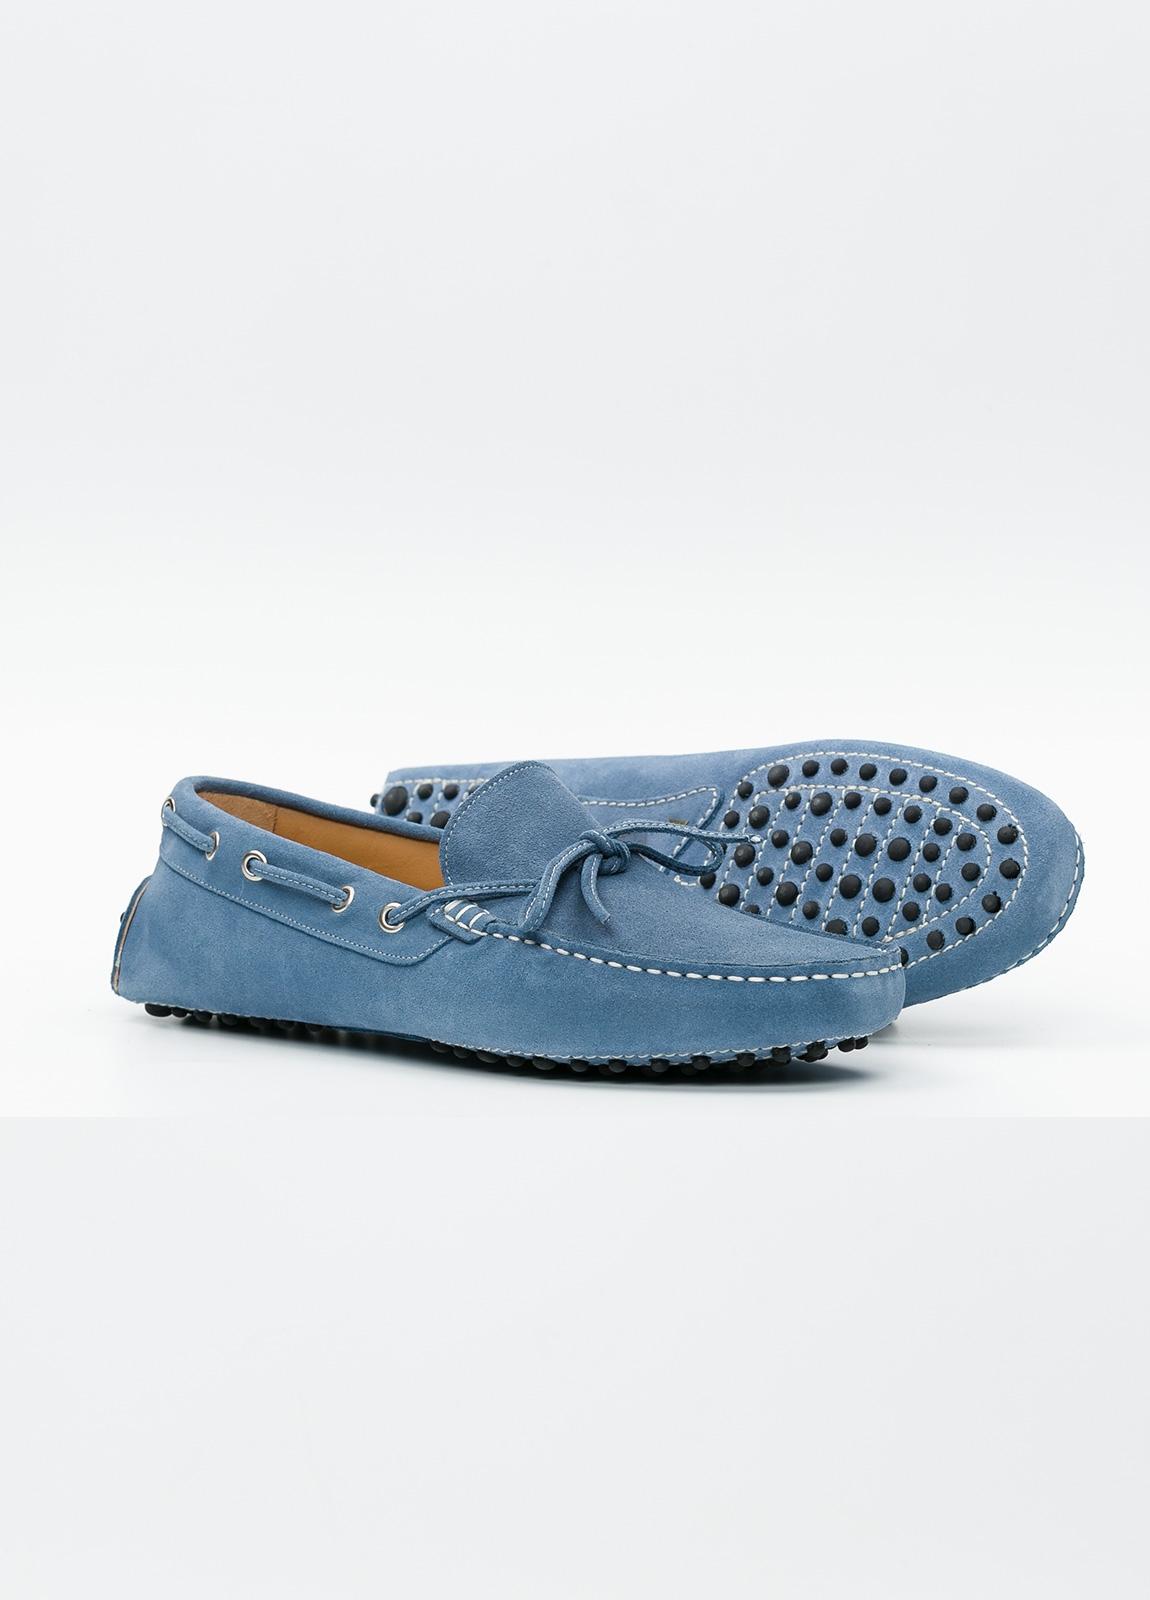 Zapato mocasín Sport color azul, 100% Piel. - Ítem3